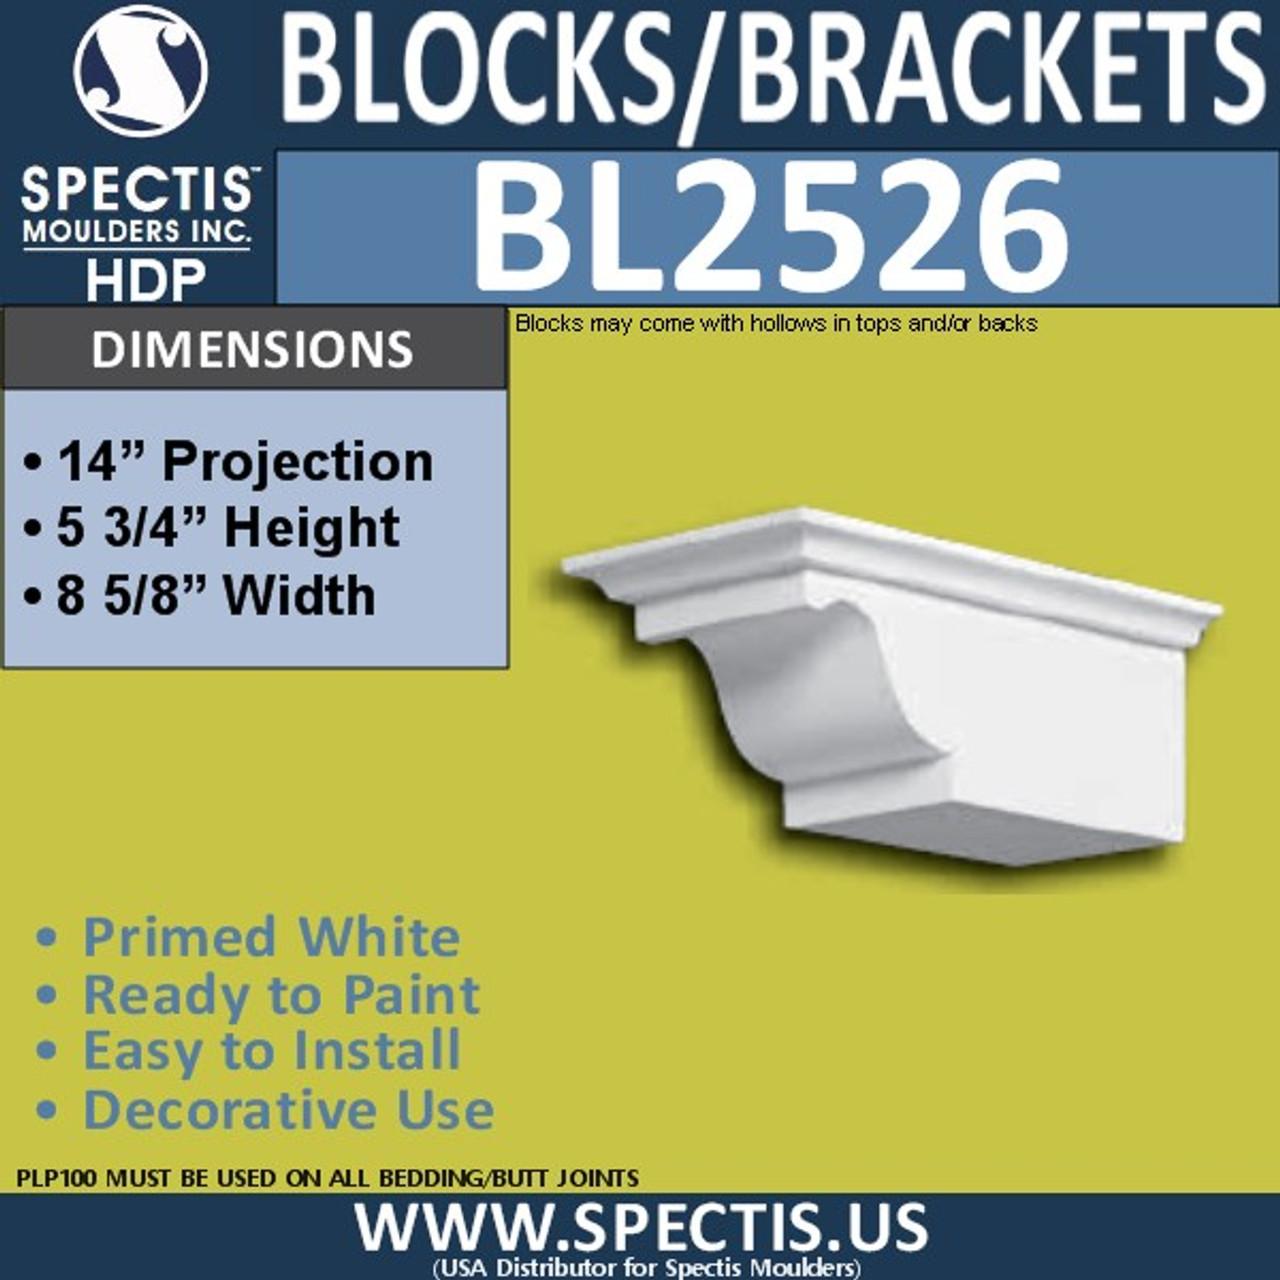 "BL2526 Eave Block or Bracket 8.5""W x 5.75""H x 14"" P"